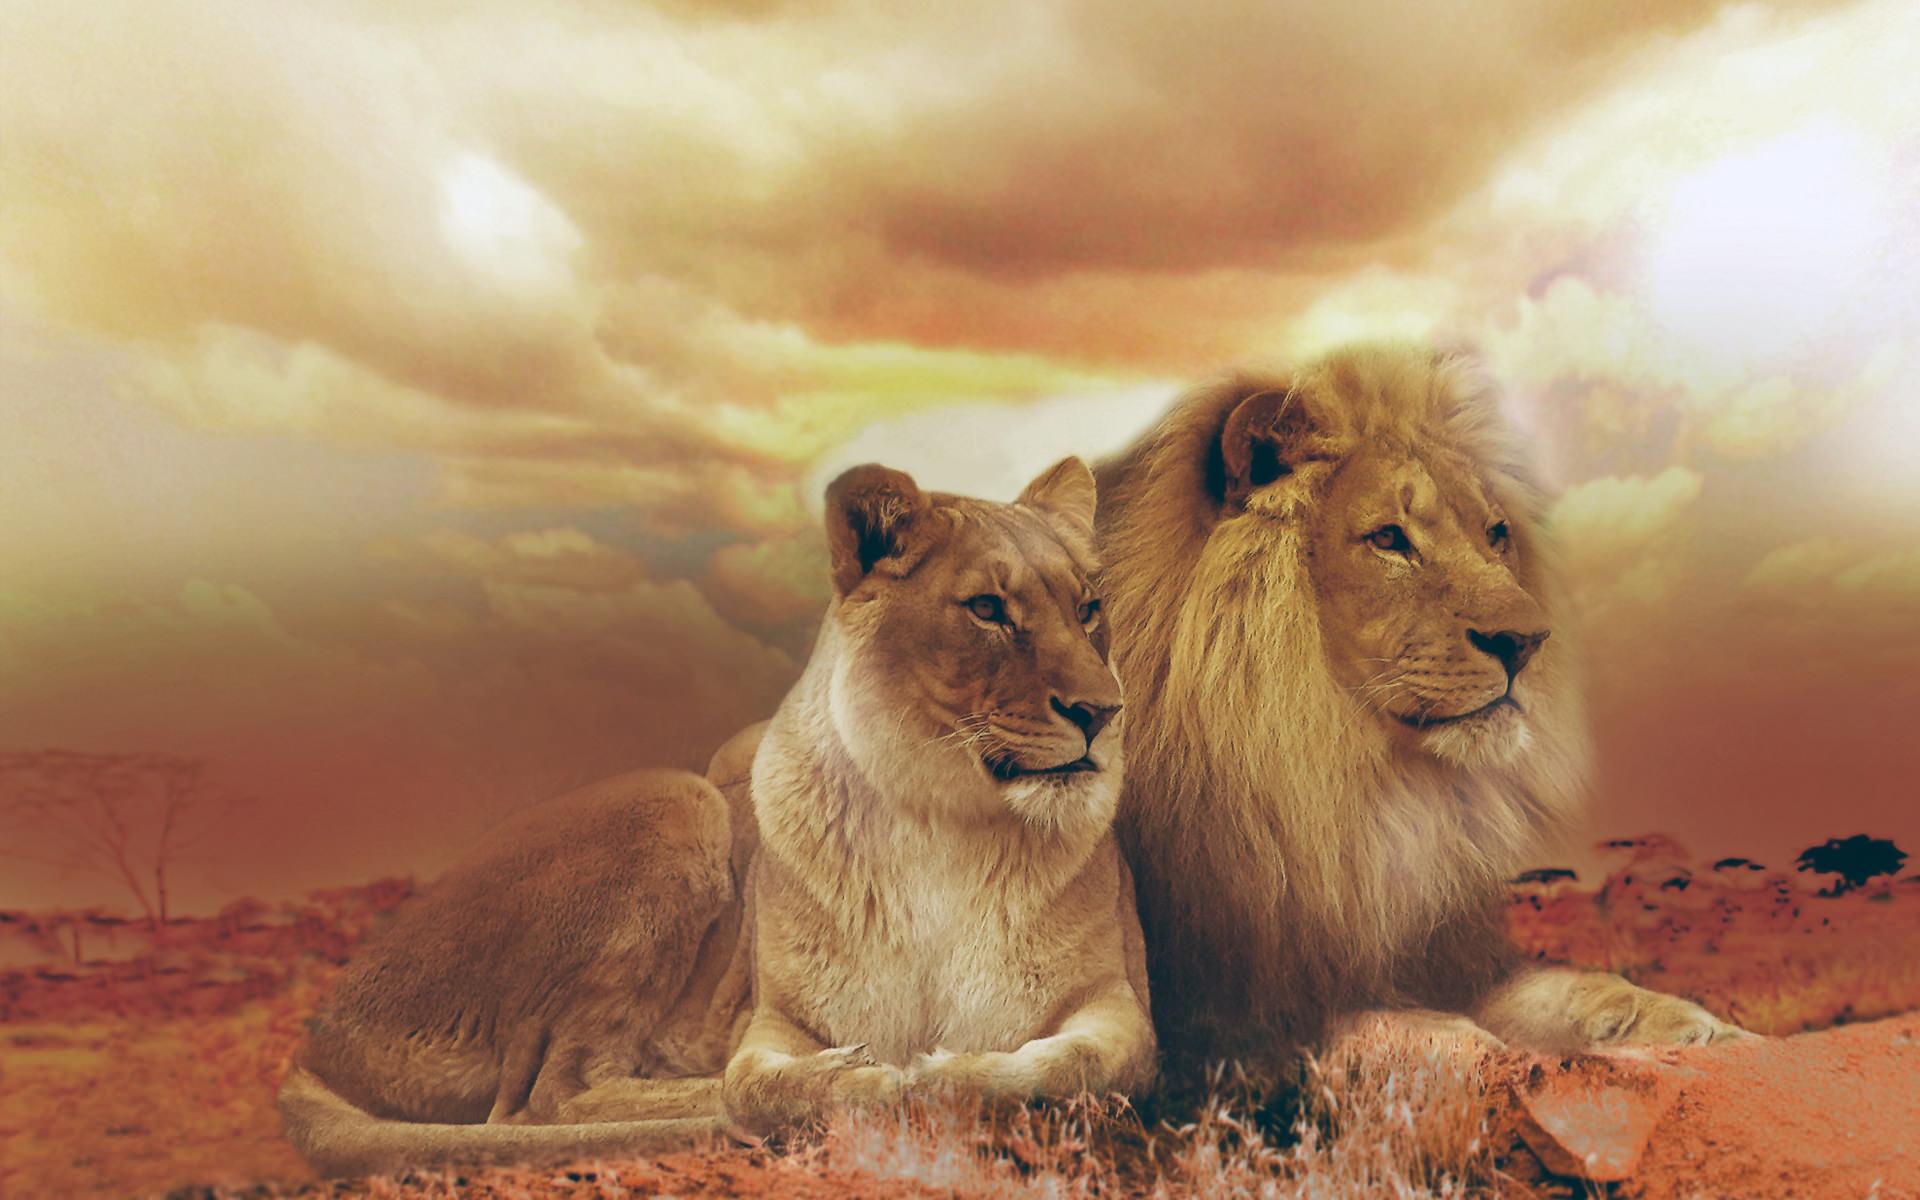 Female & Male Lions Wallpaper